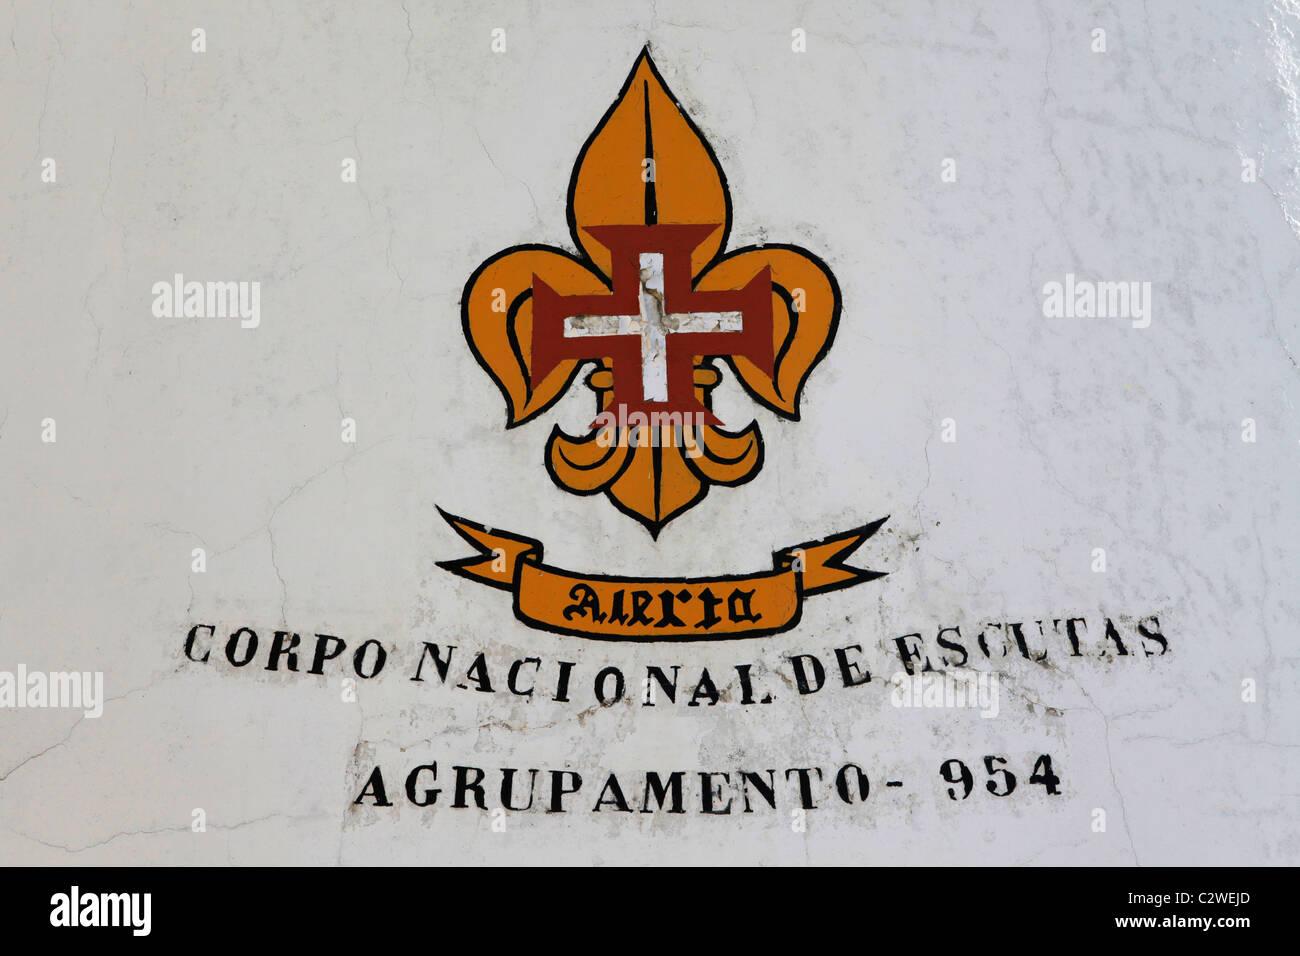 A Fleur De Lis Symbol Marks The Headquarters Of A Scout Group In